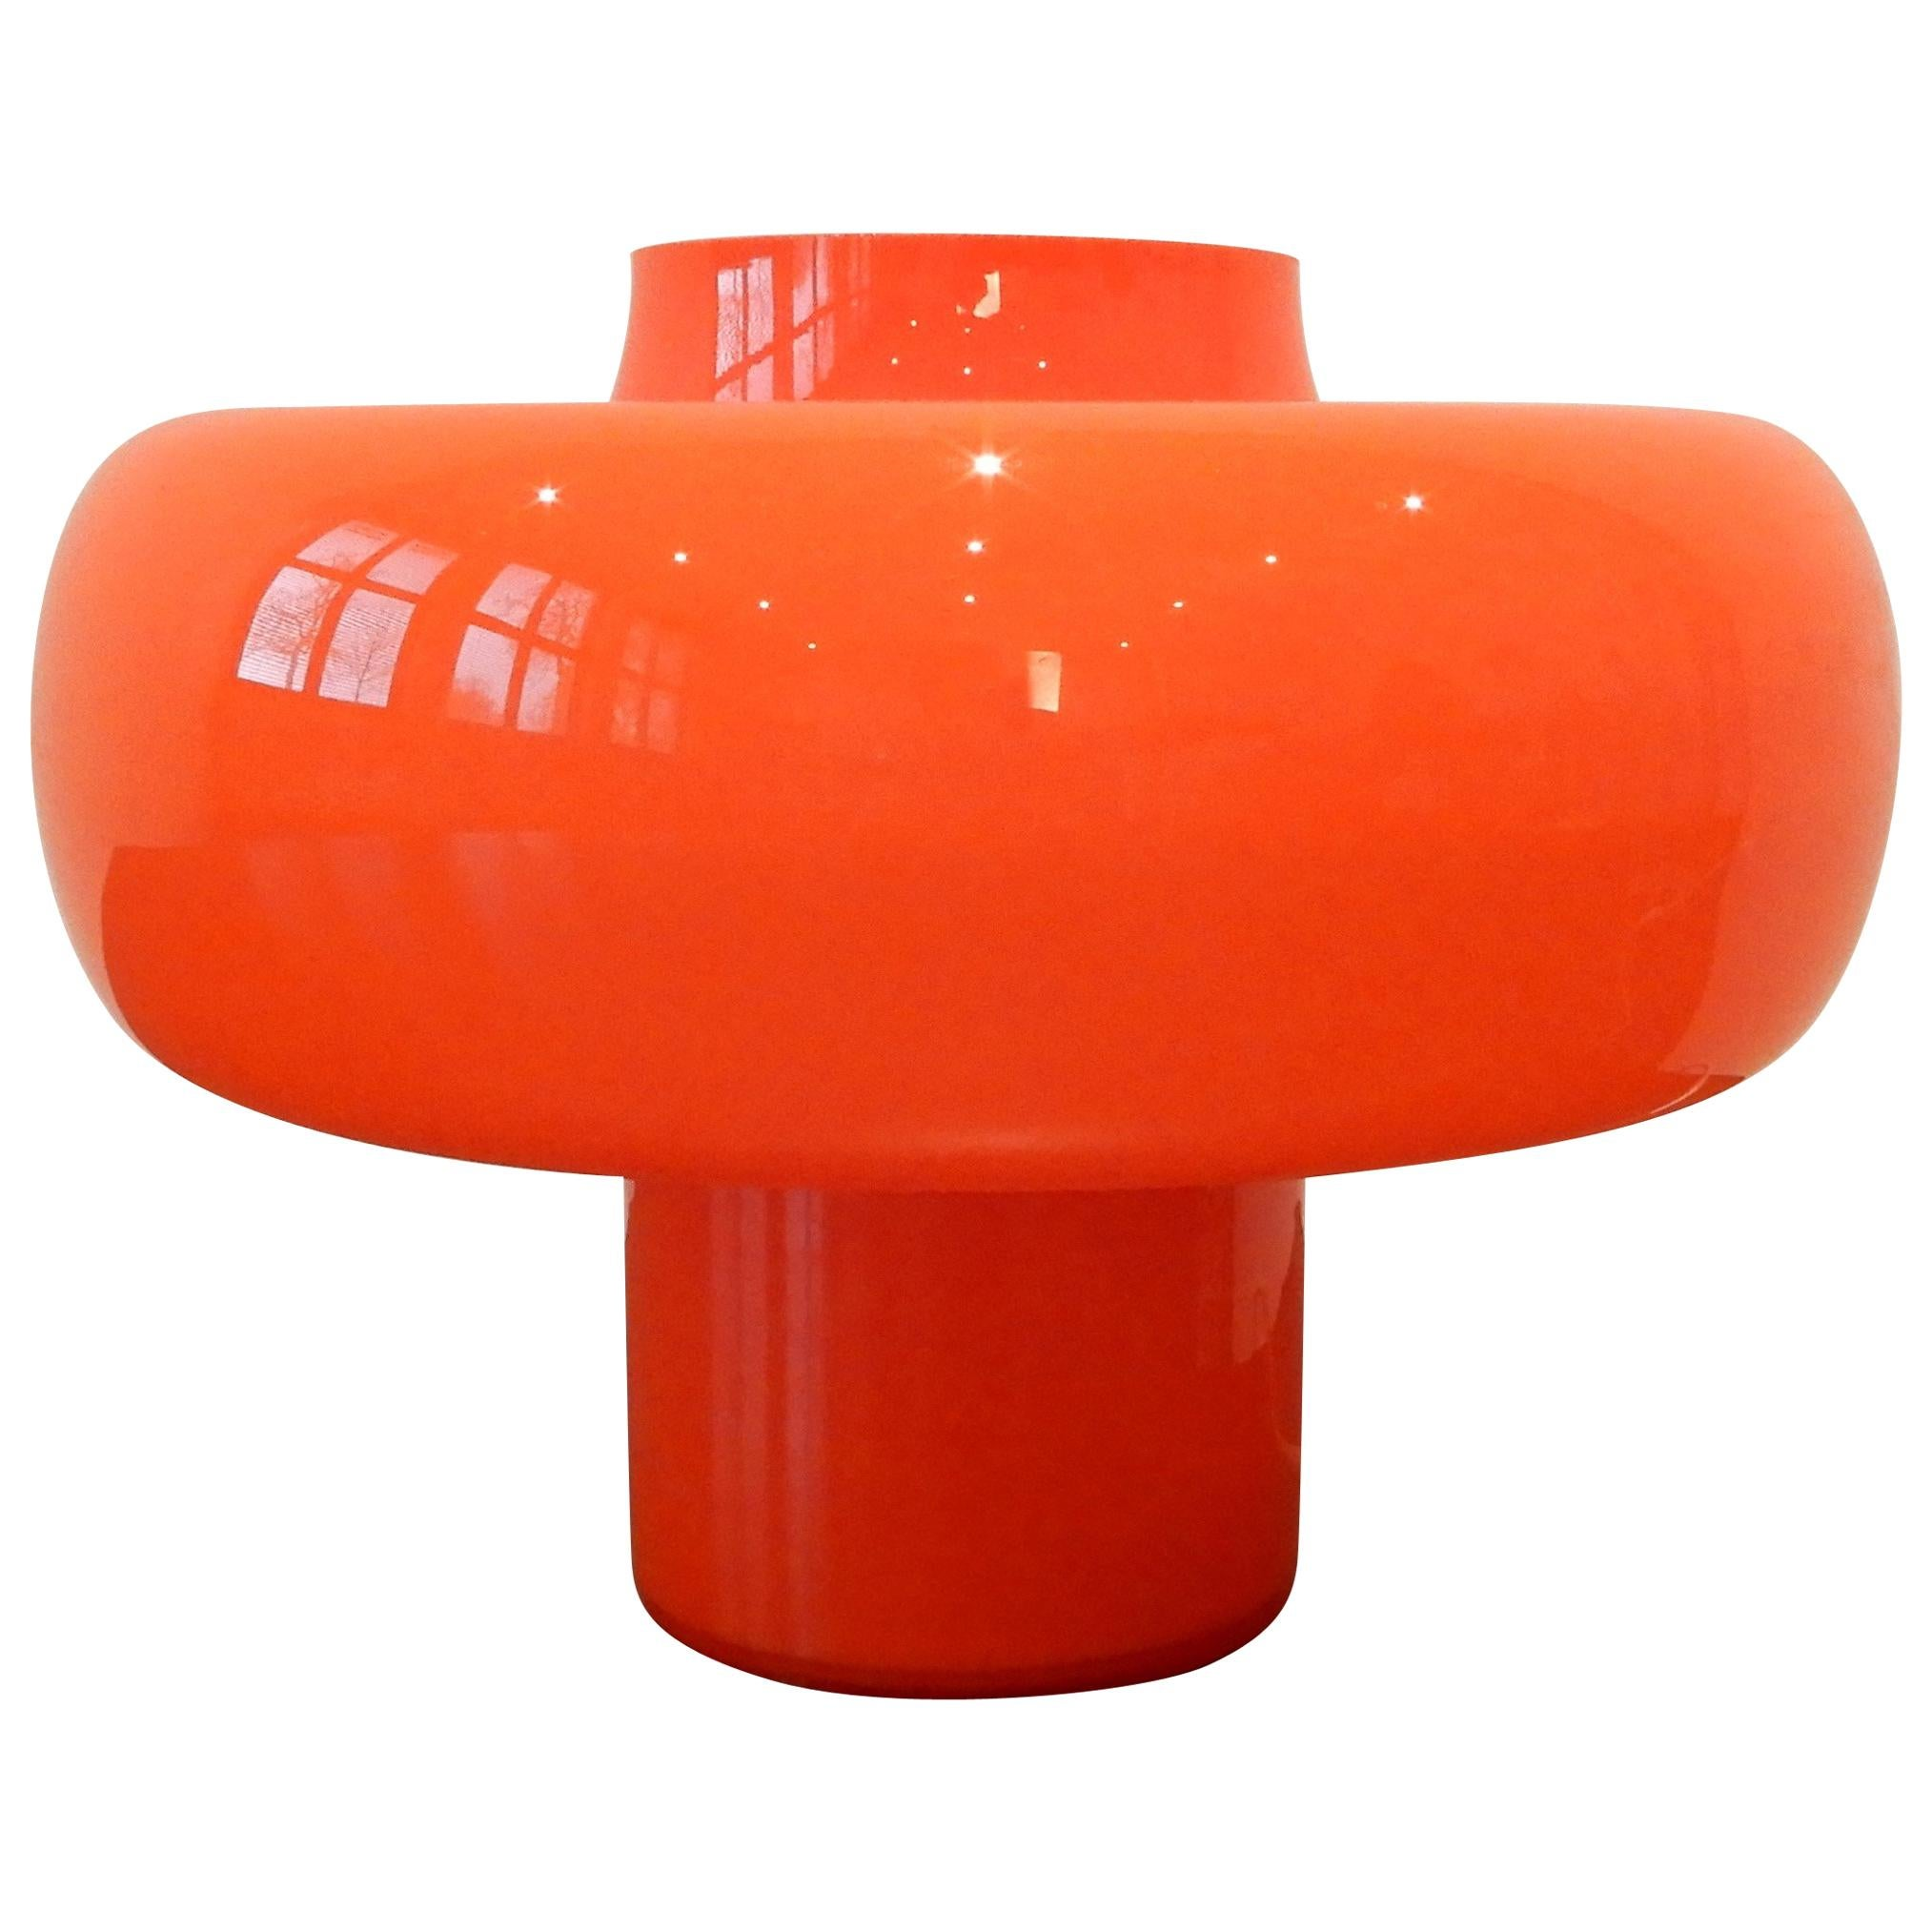 Swedish Orange Glass Table Lamp, 1960s Vintage Design